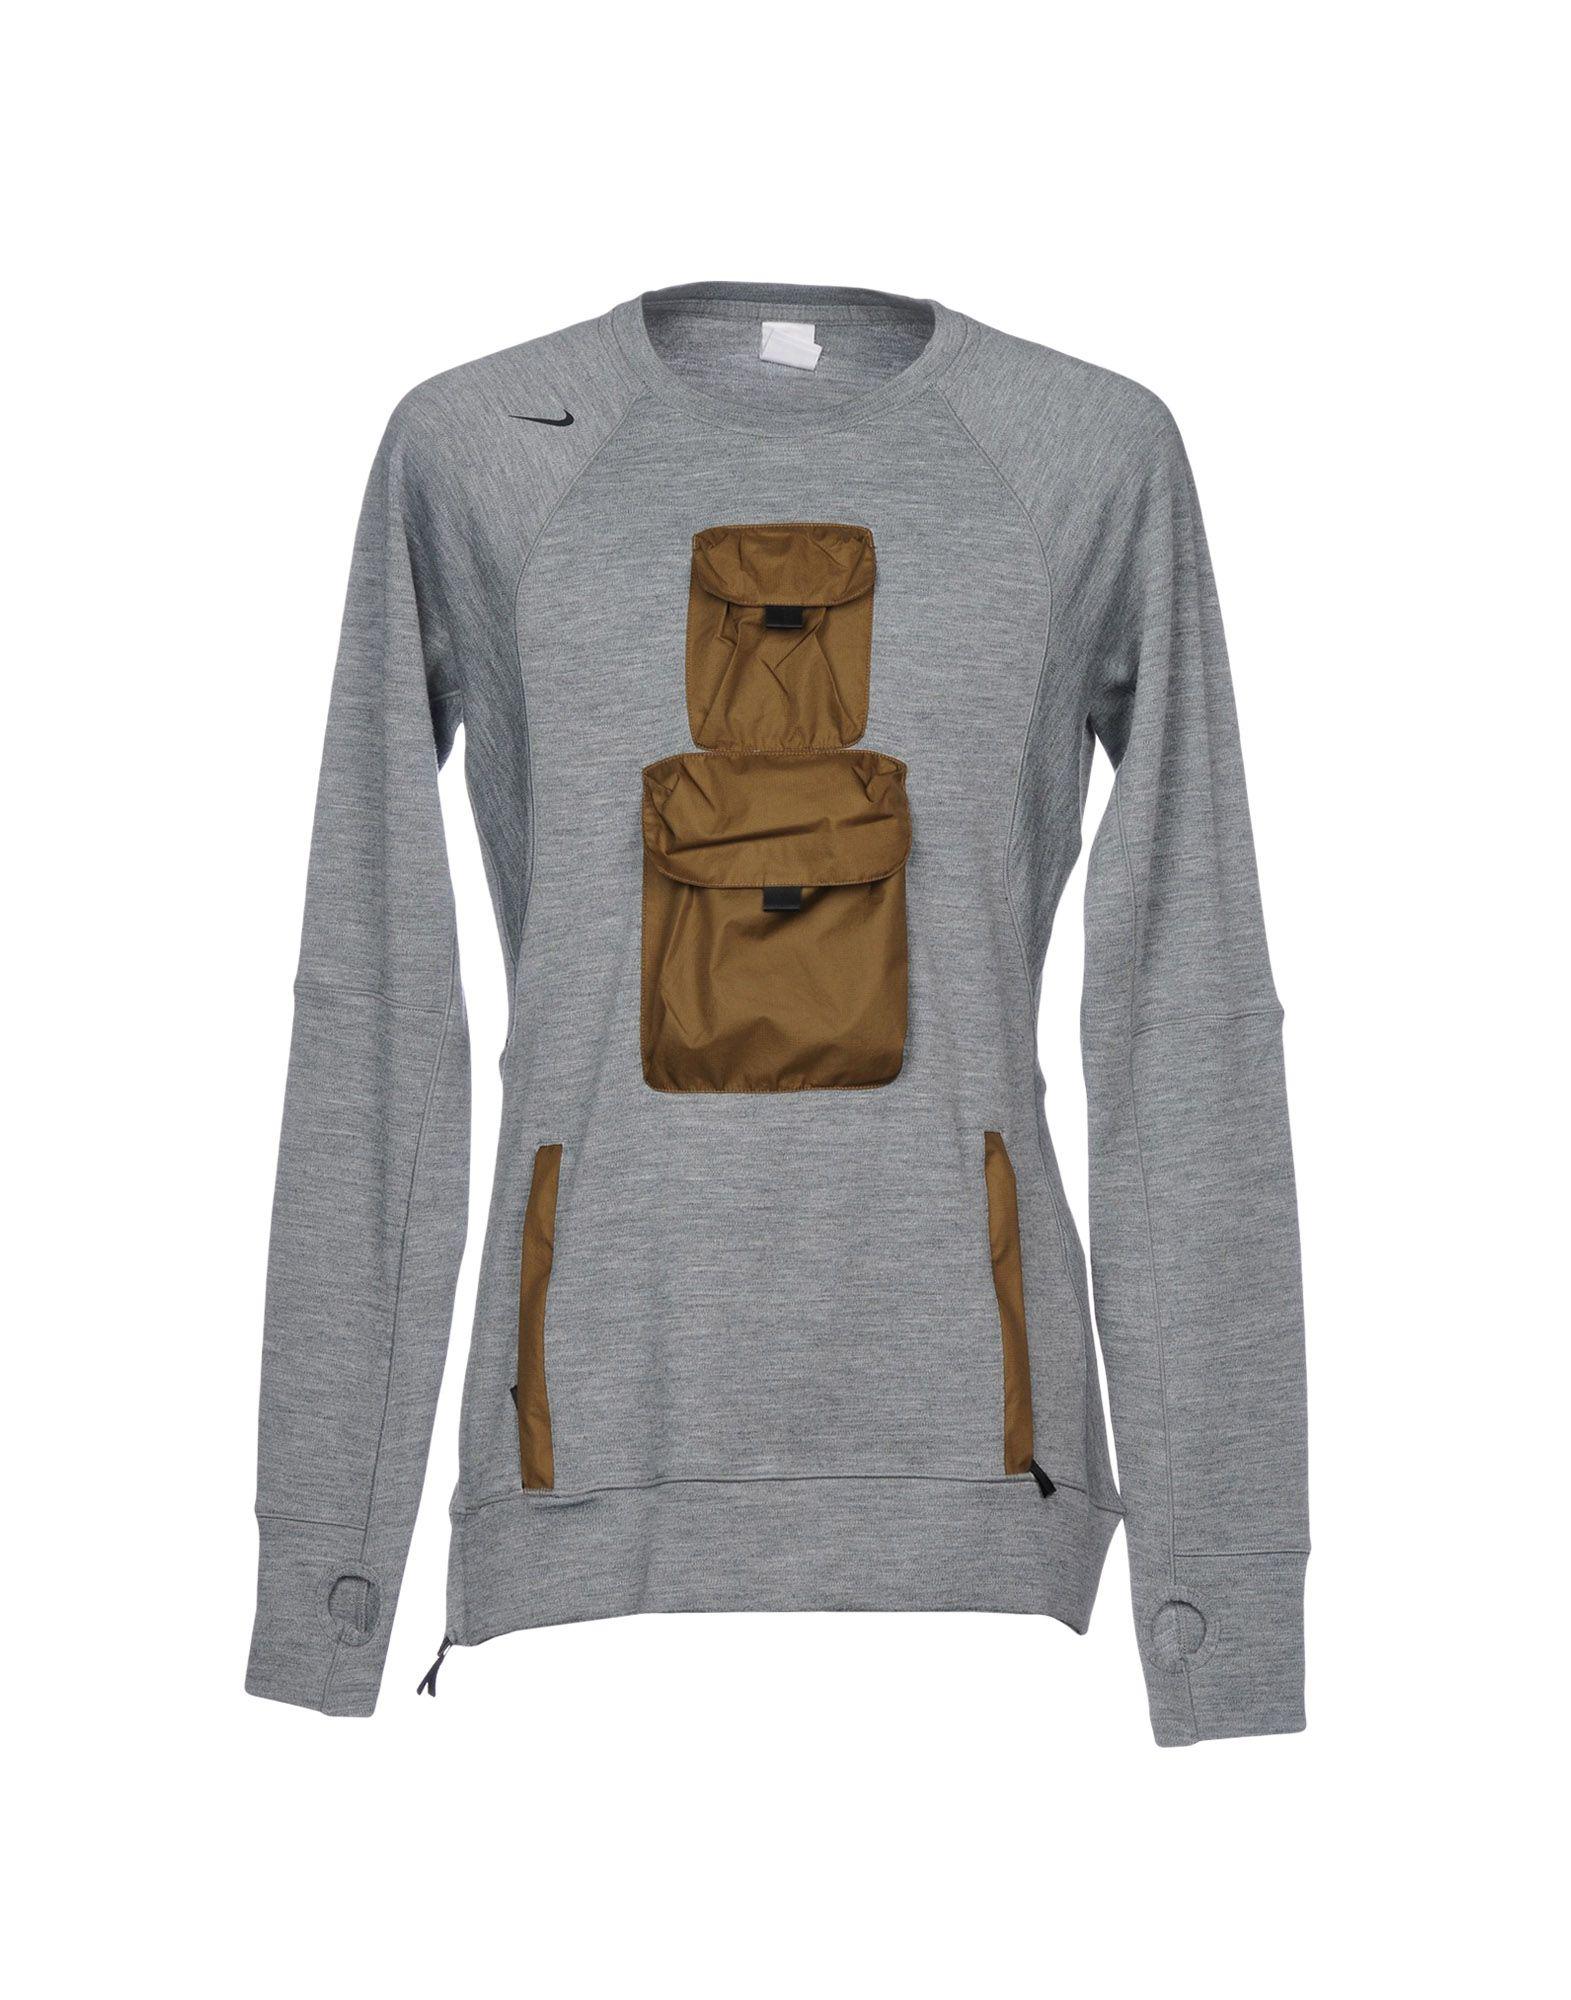 Felpa Nike Donna - Acquista online su